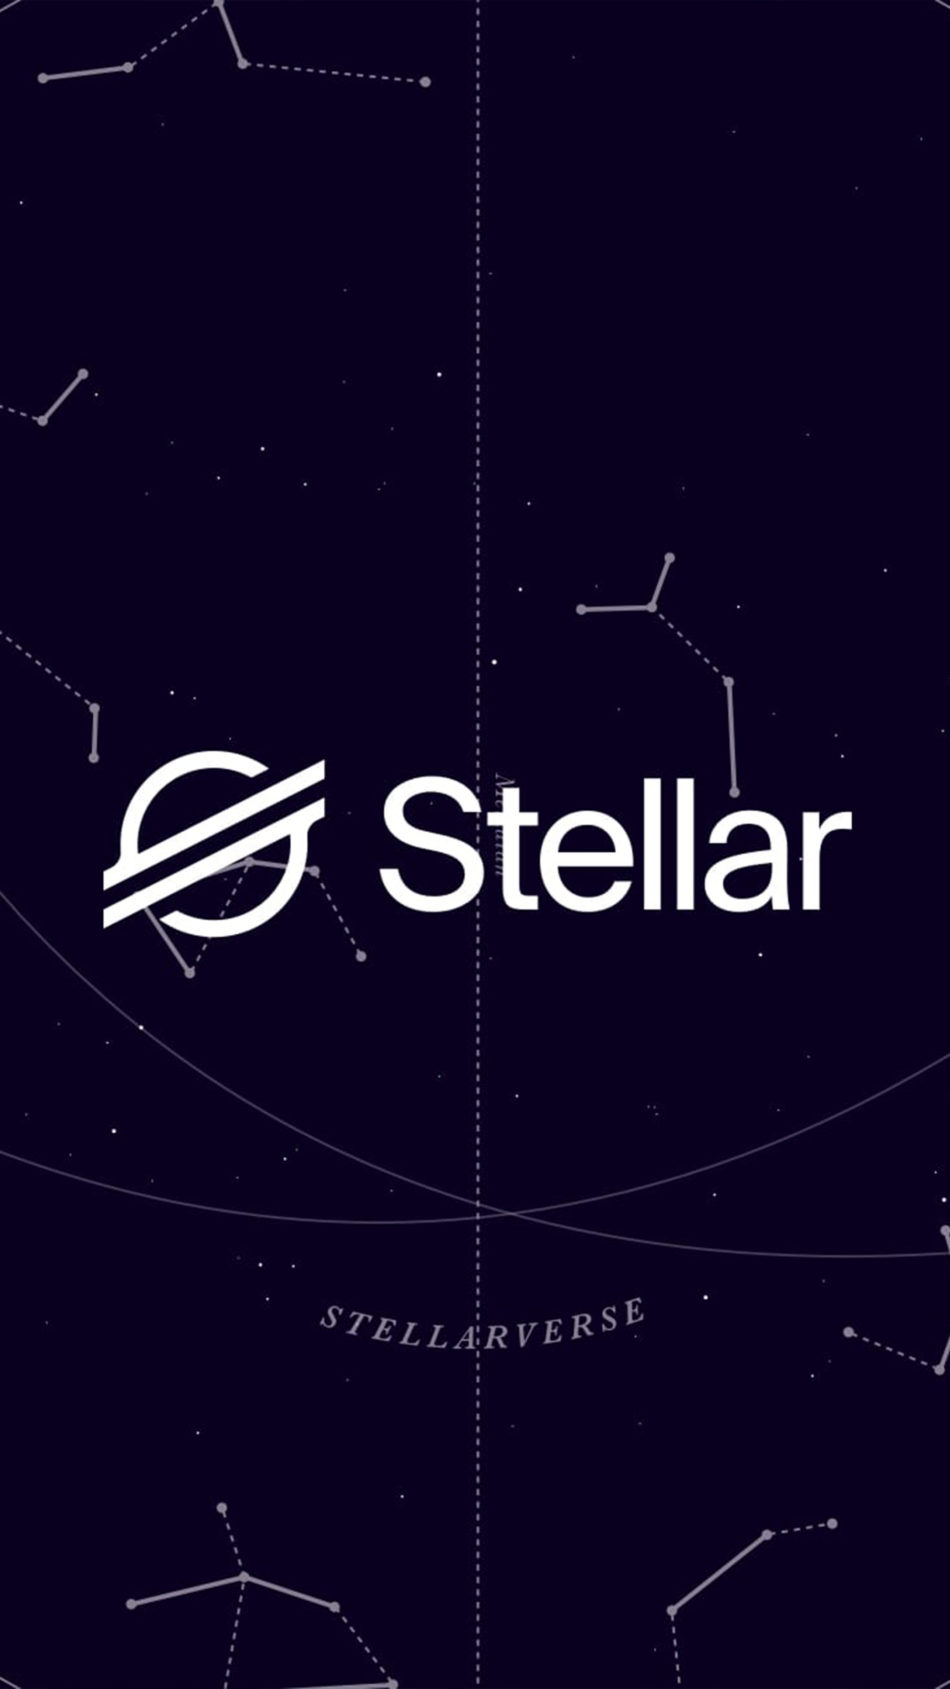 Stellar Lumens Cryptocurrency Logo 4K Ultra HD Mobile Wallpaper